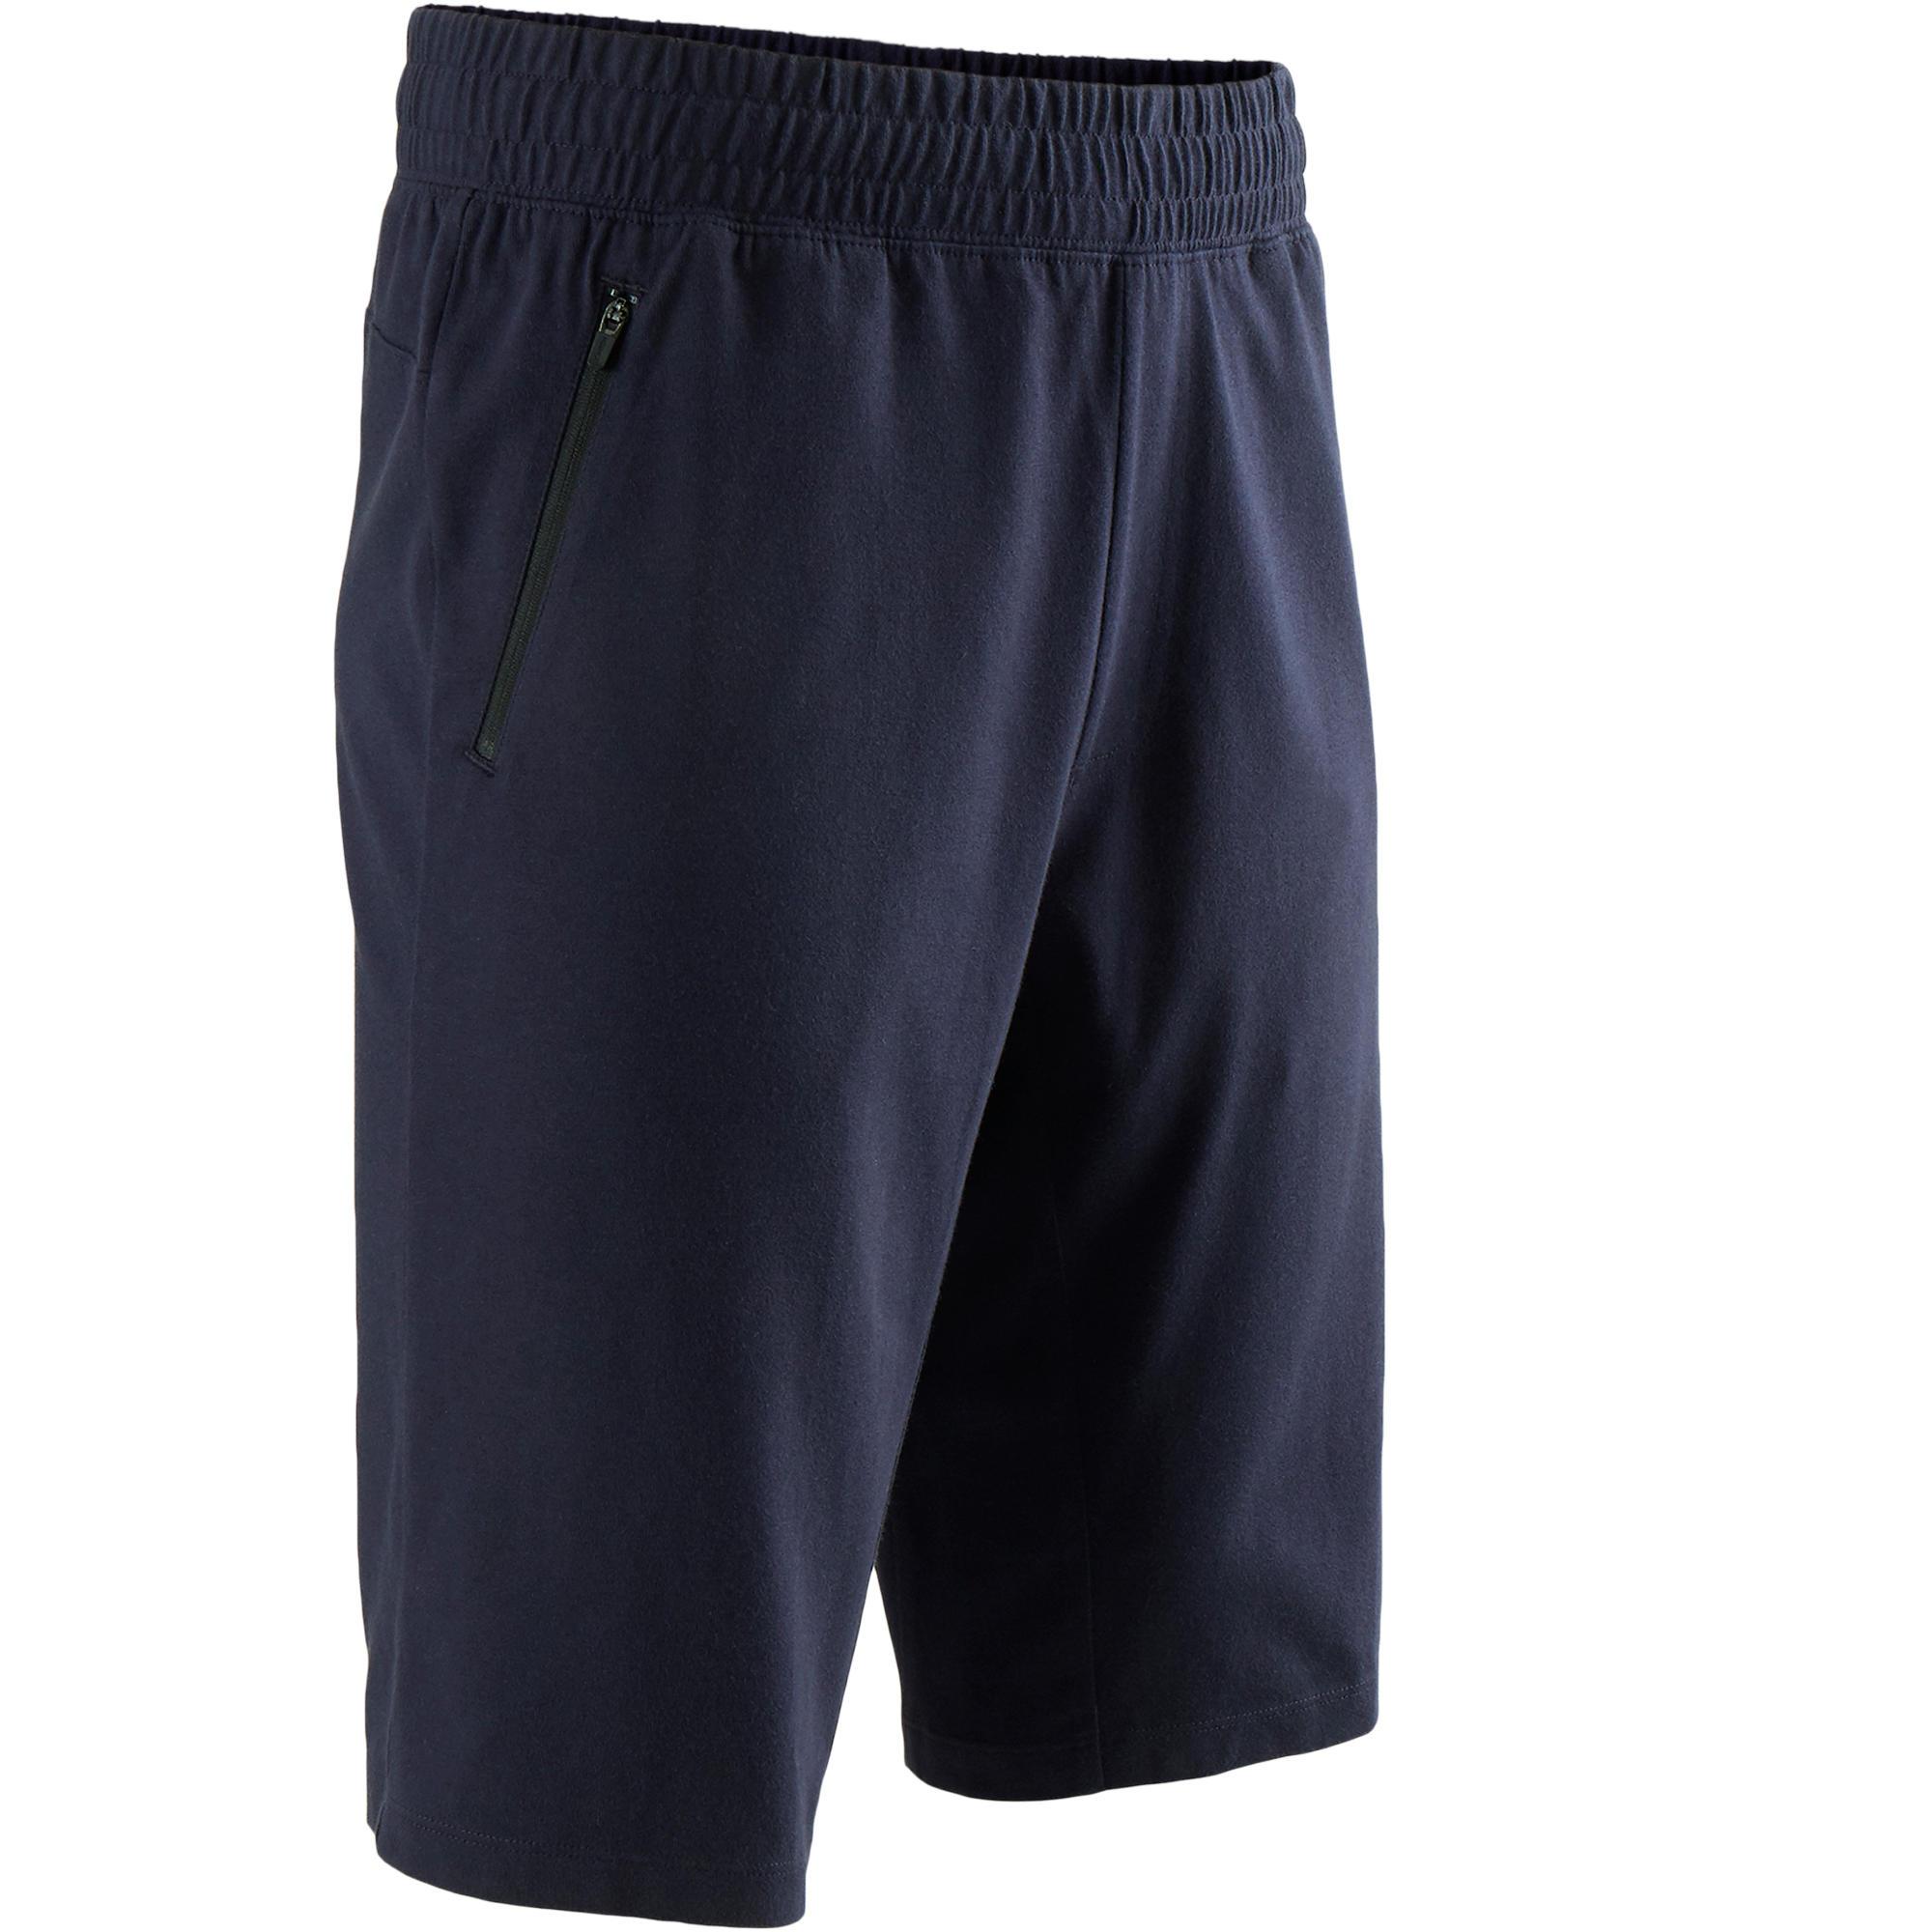 Domyos Short 520 slim fit tot boven de knie pilates en lichte gym heren marineblauw